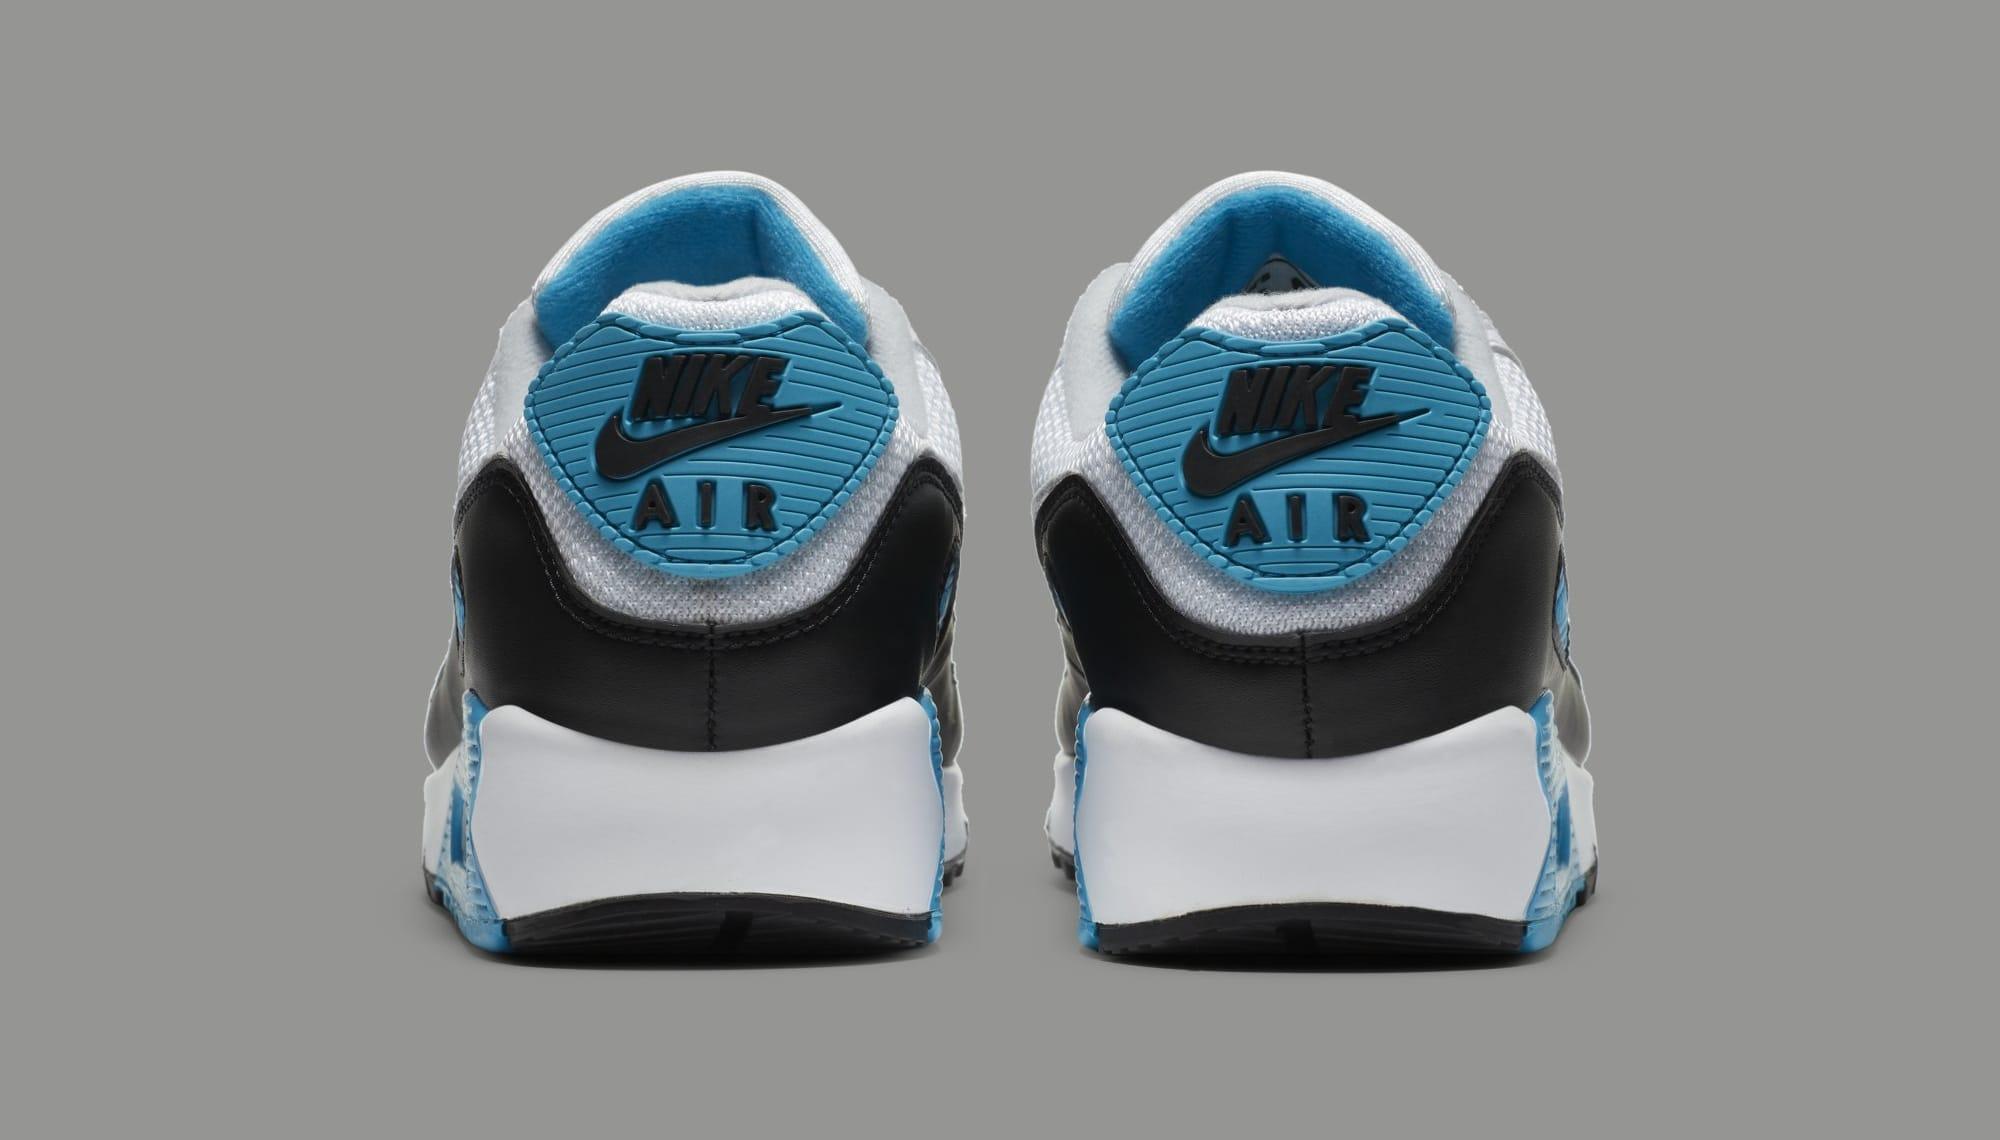 Nike Air Max 90 'Laser Blue' CJ6779-100 Heel